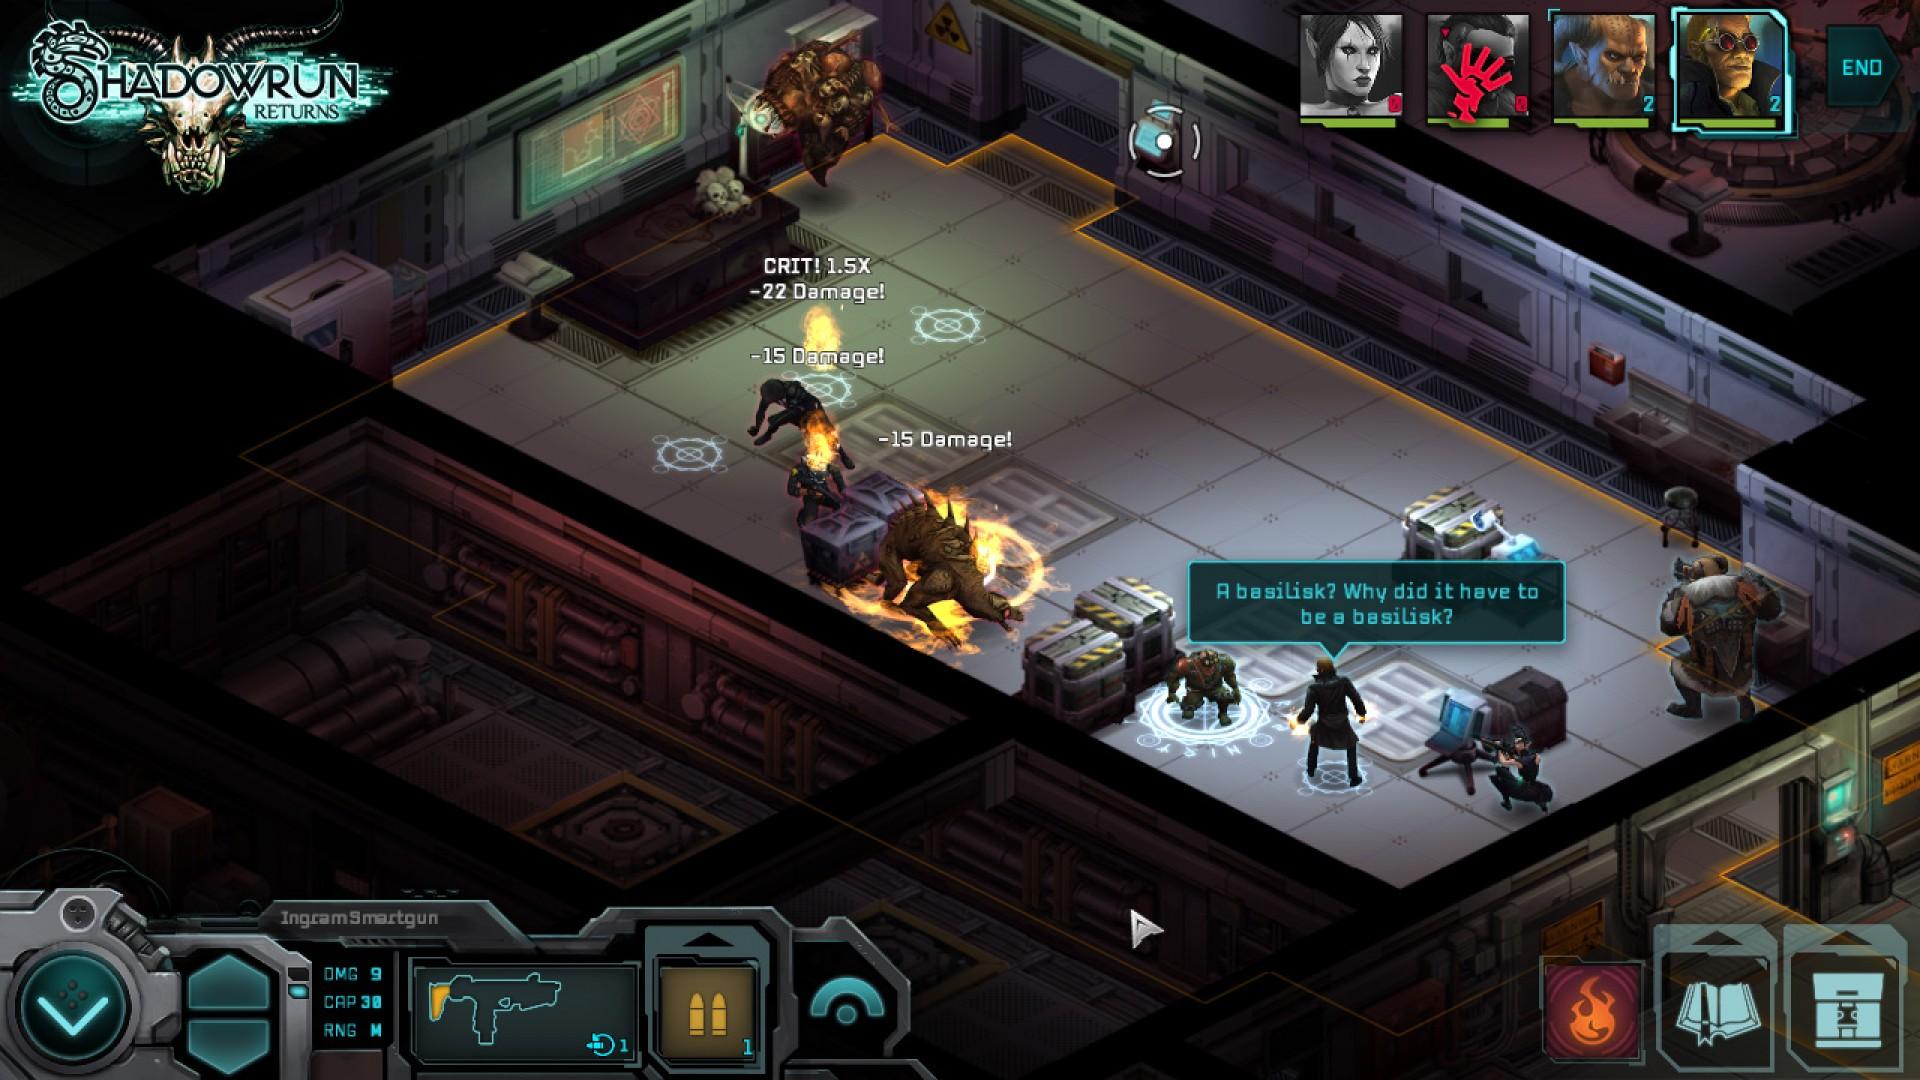 Shadowrun Returns Deluxe DLC screenshot